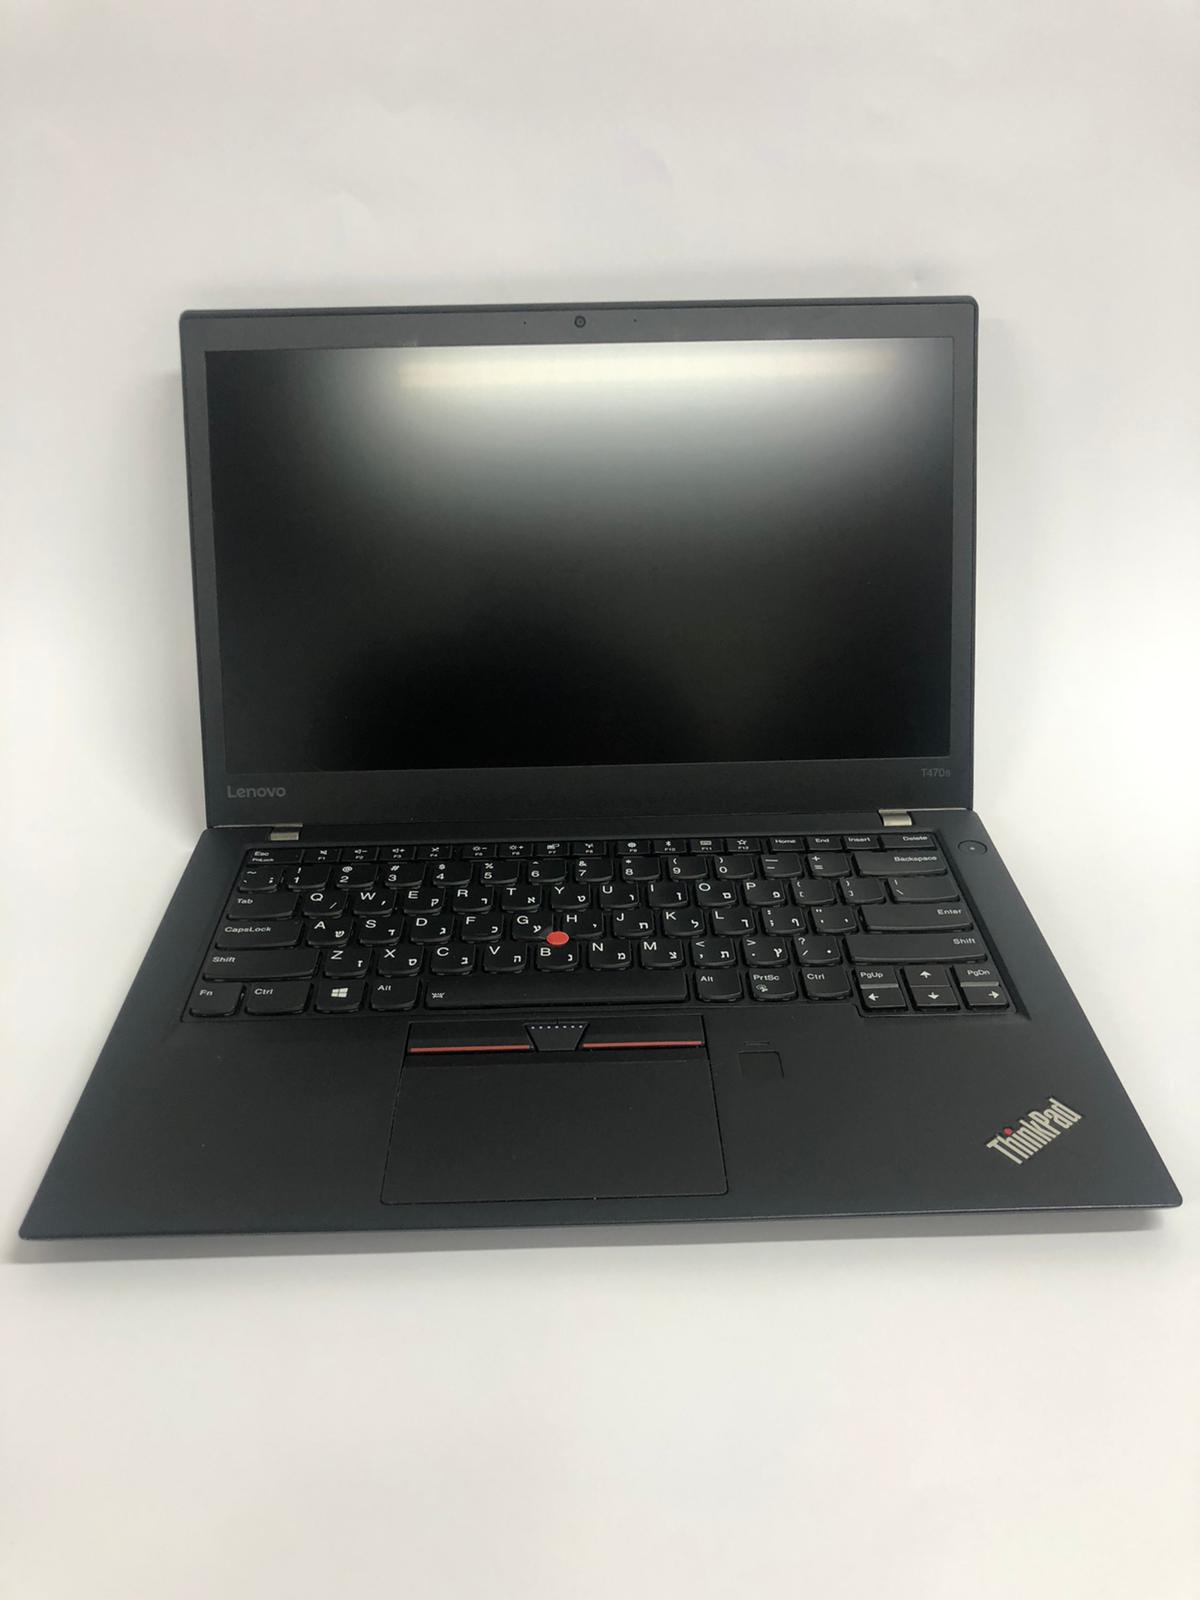 T470s i7-6600U/8GB/256M2/FHD/F/C/W10P Lenovo ThinkPad מחשב נייד